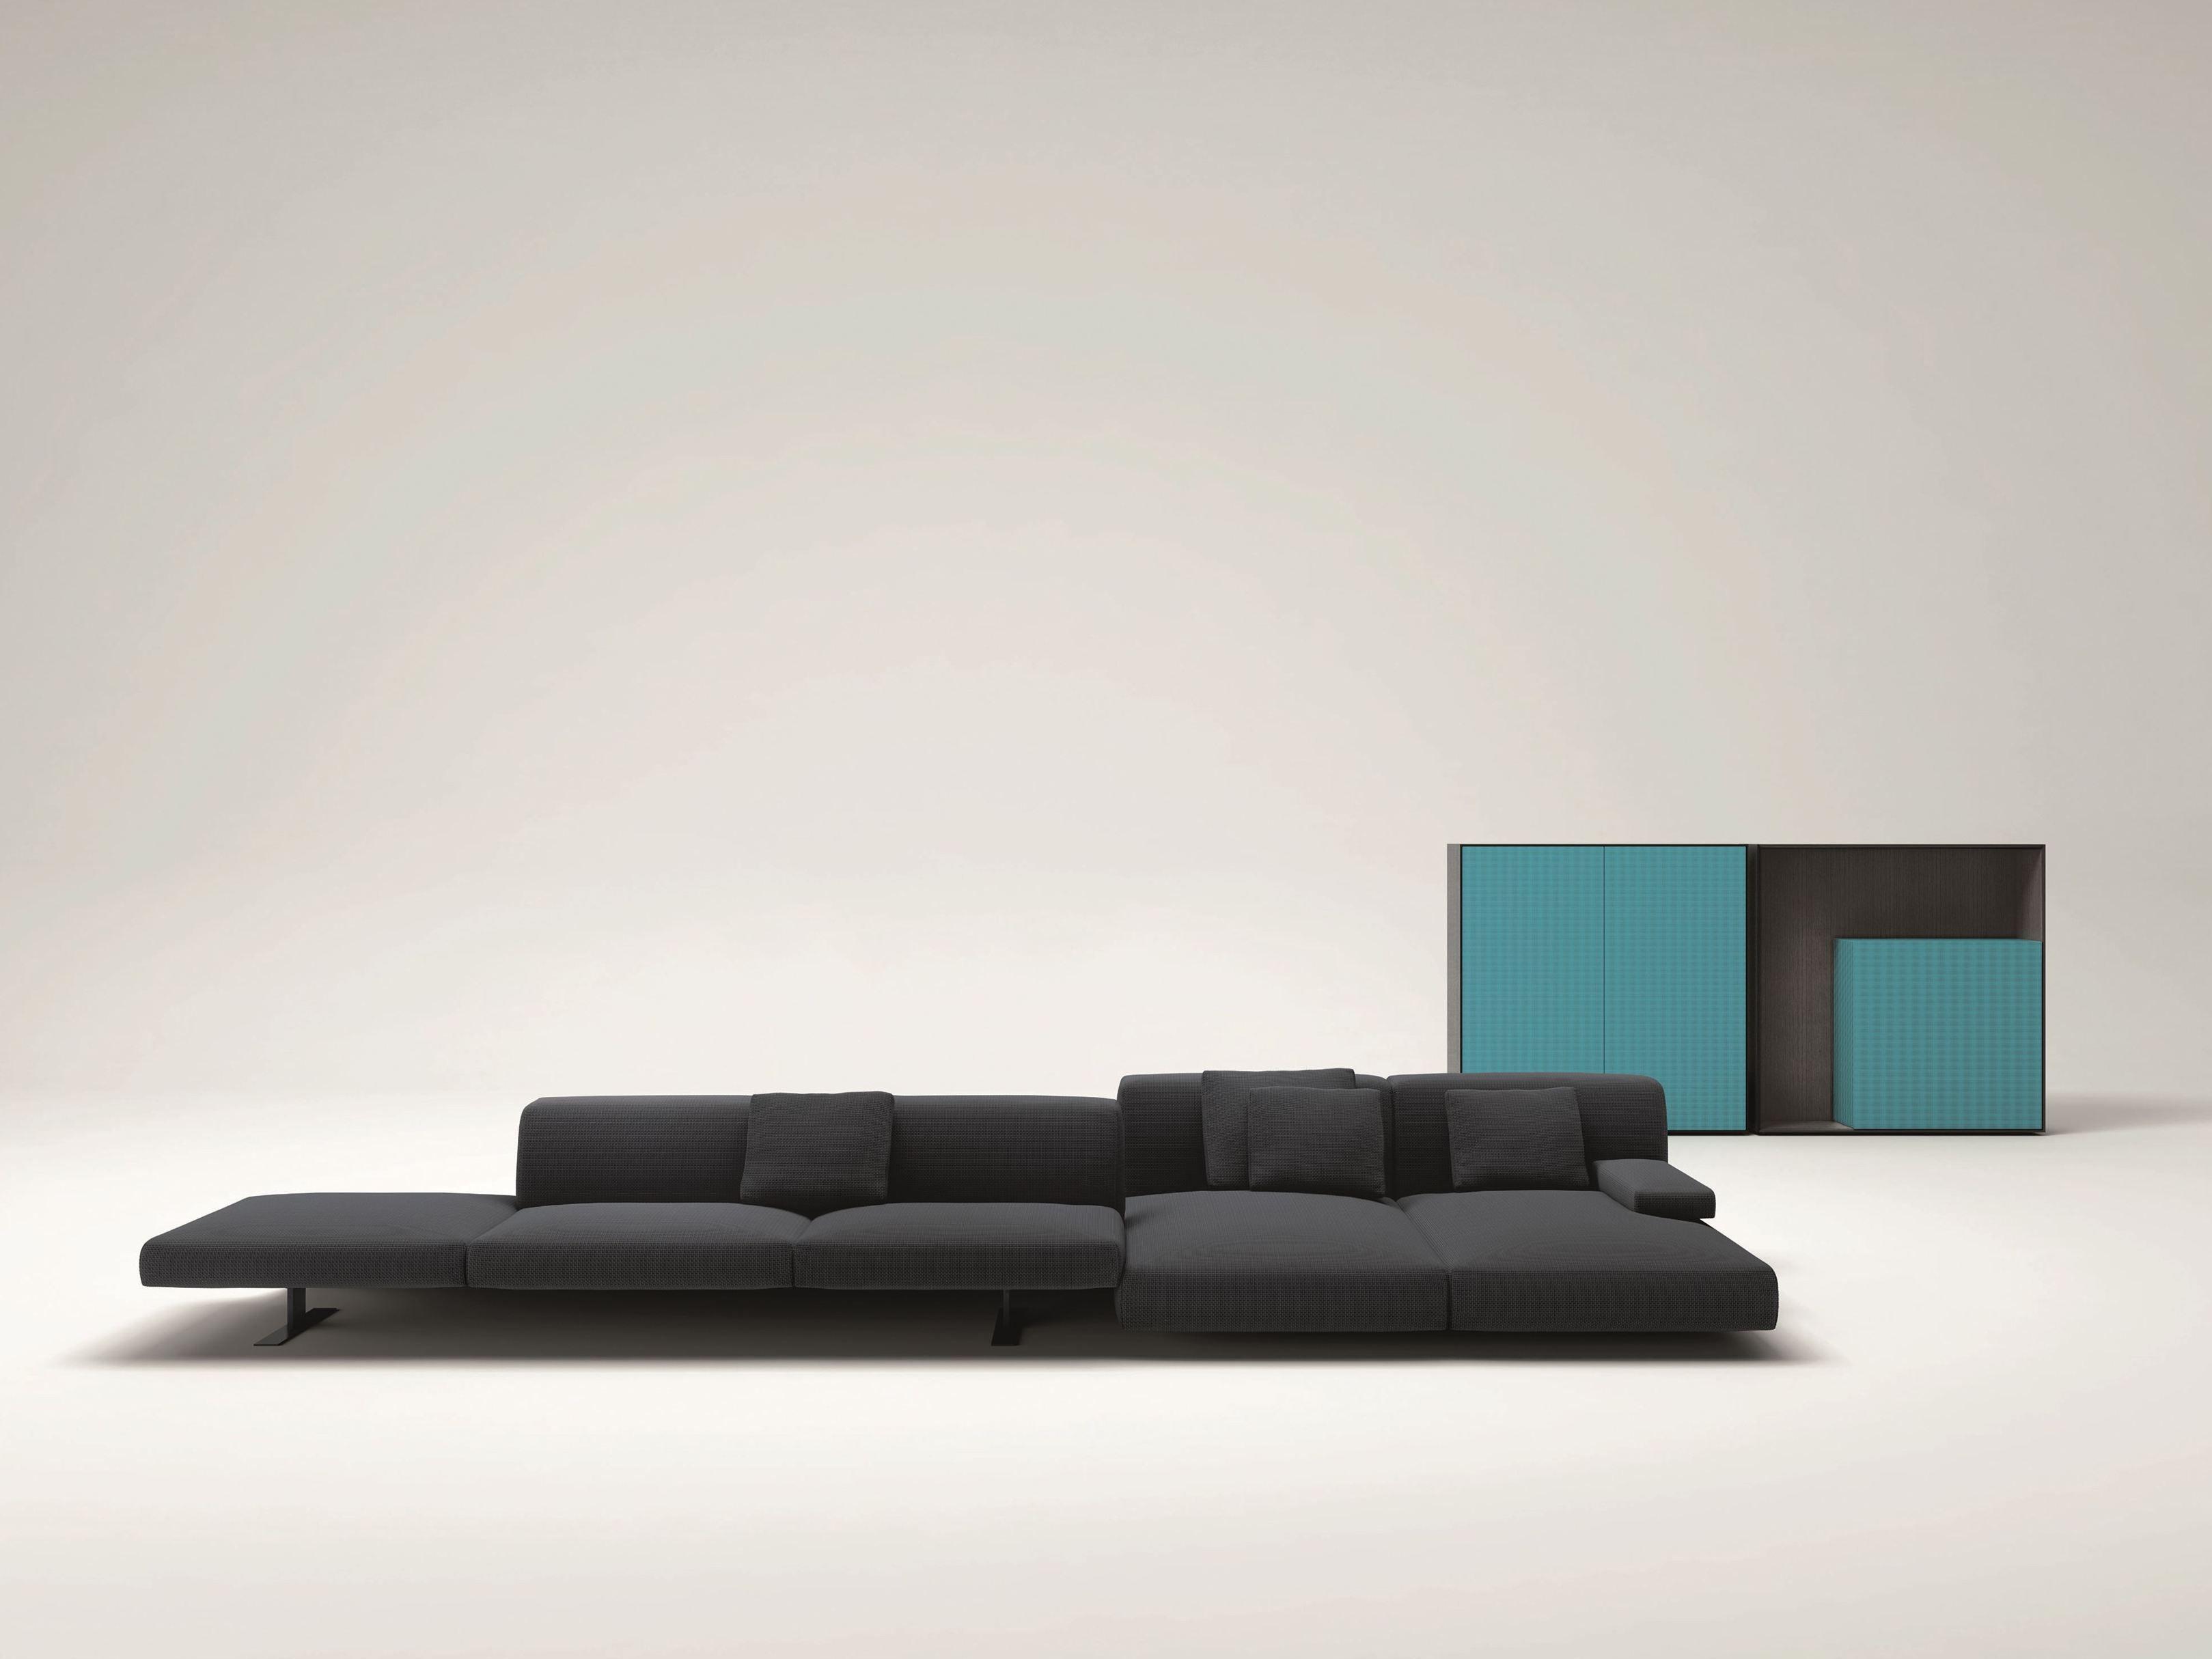 Divano modulare move by paola lenti design francesco rota for Paola lenti